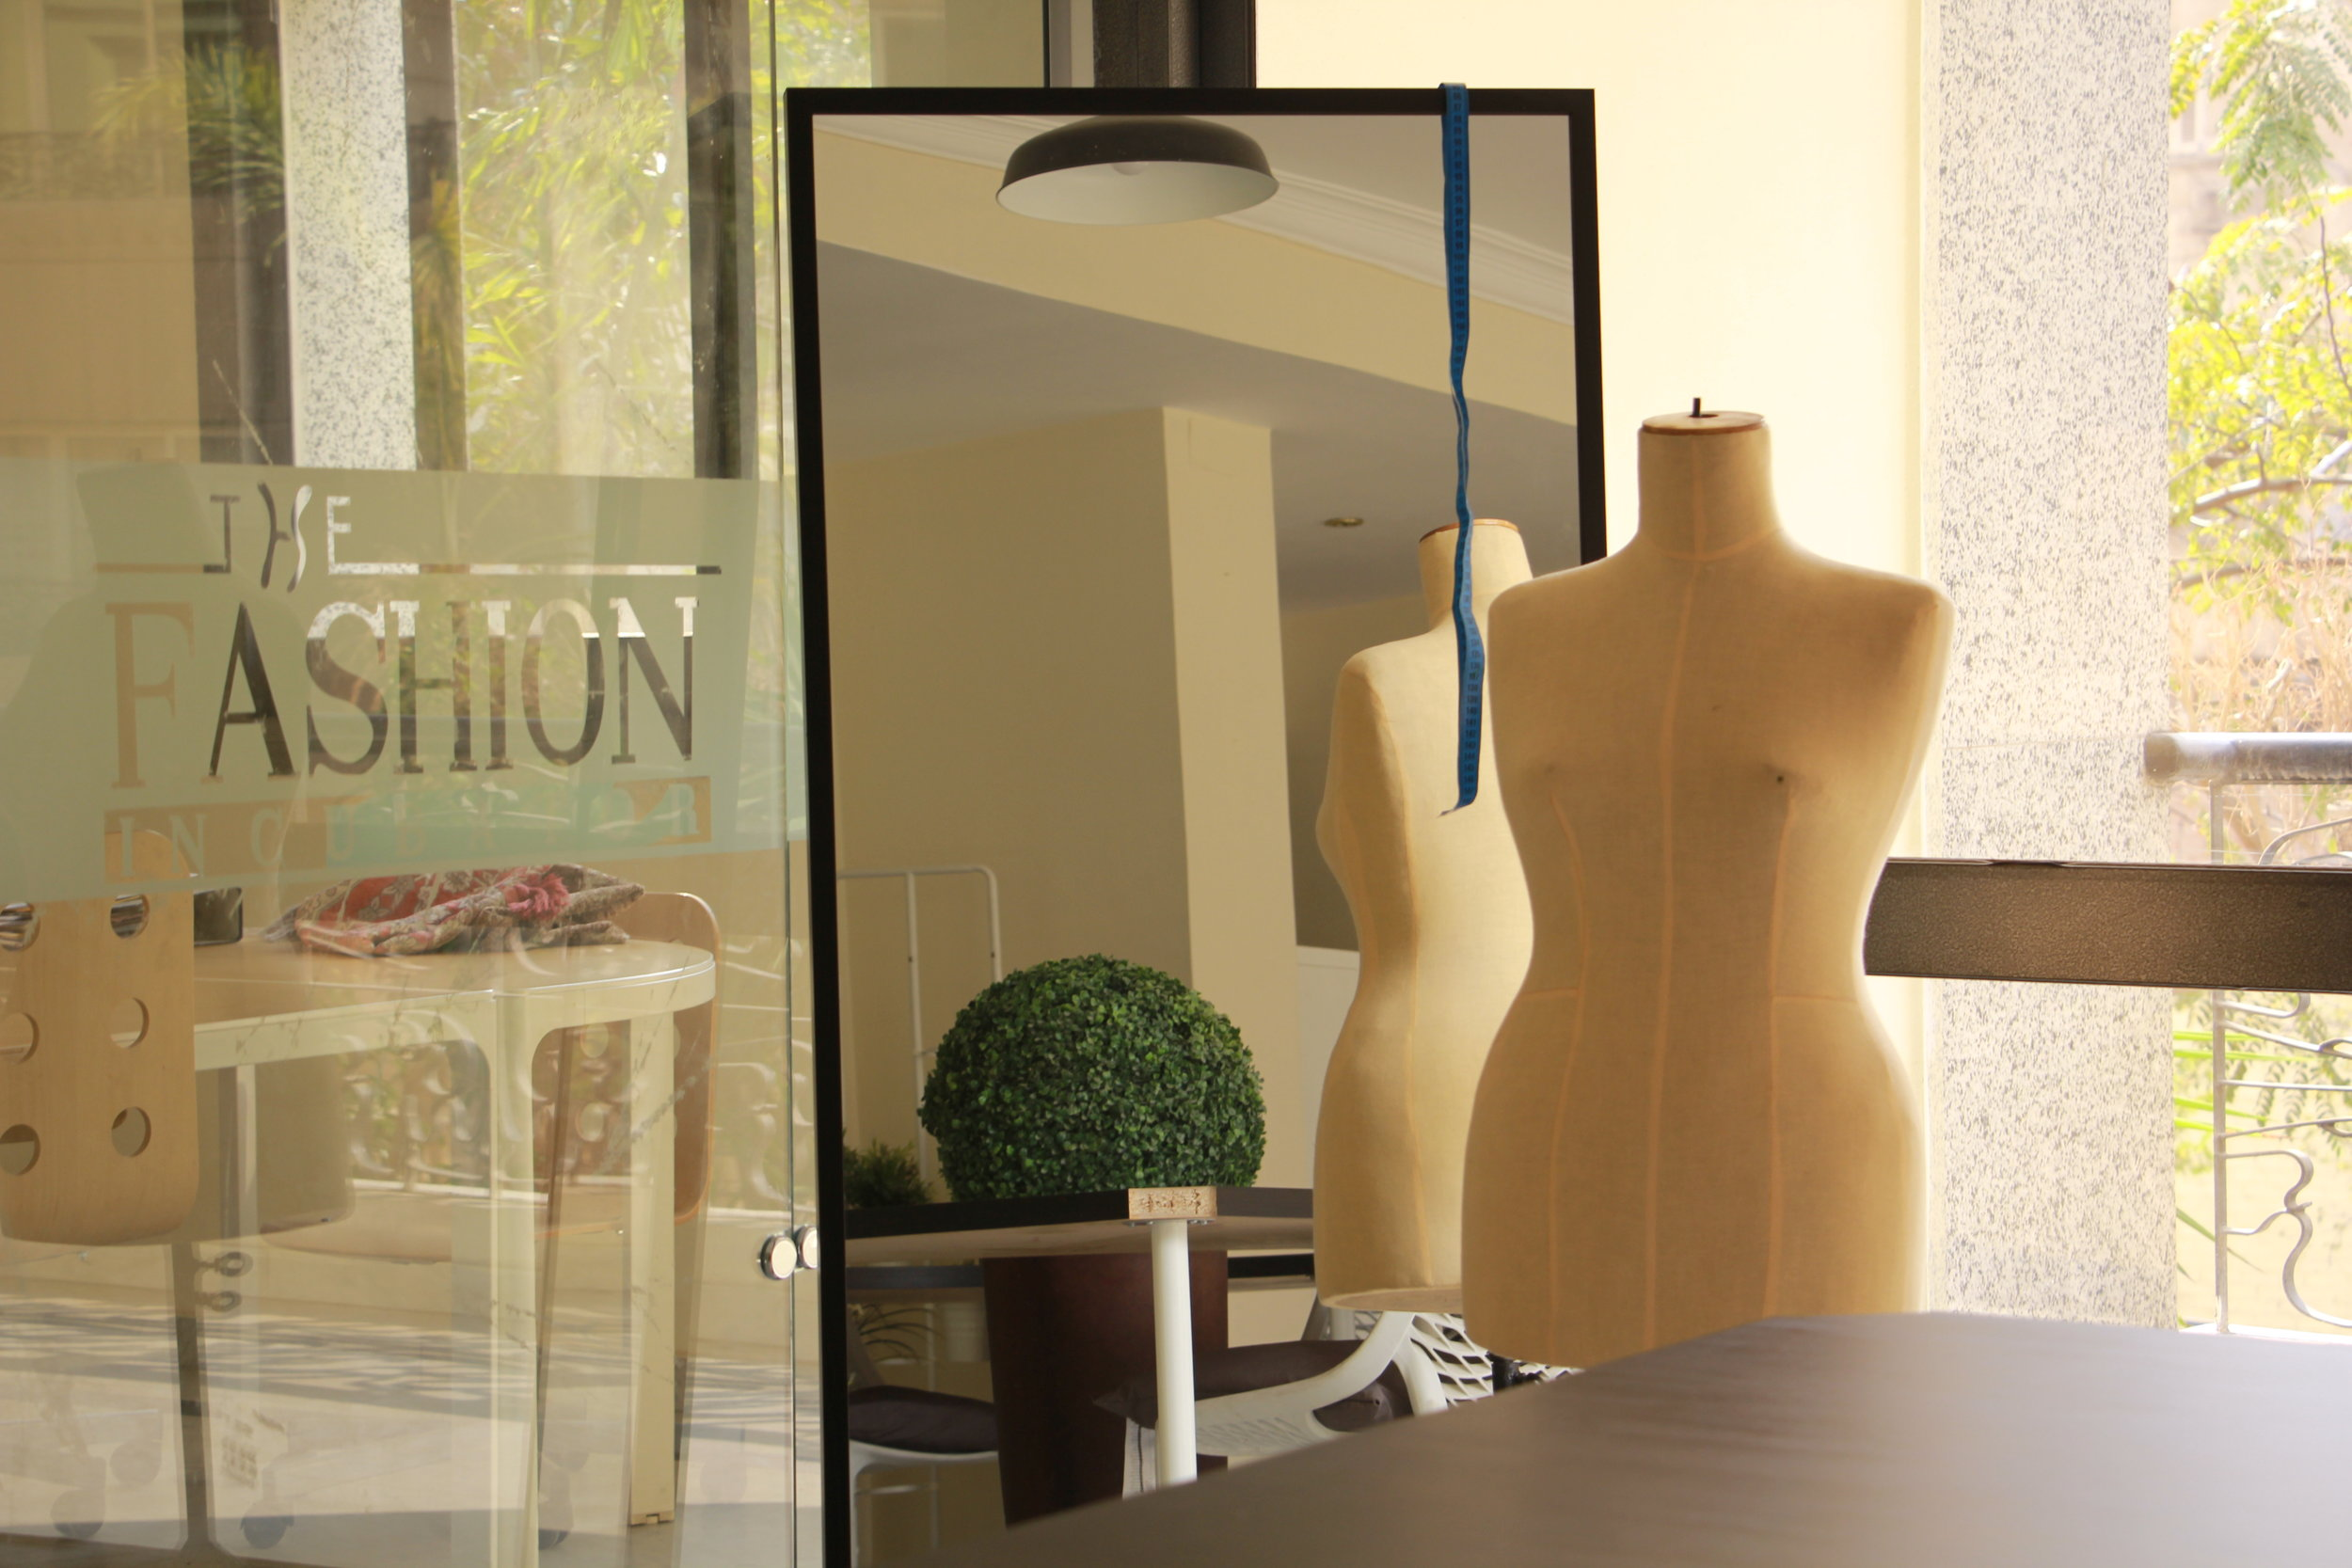 Photo: Courtesy of The Fashion Incubator | www.thefashionincubatorme.com